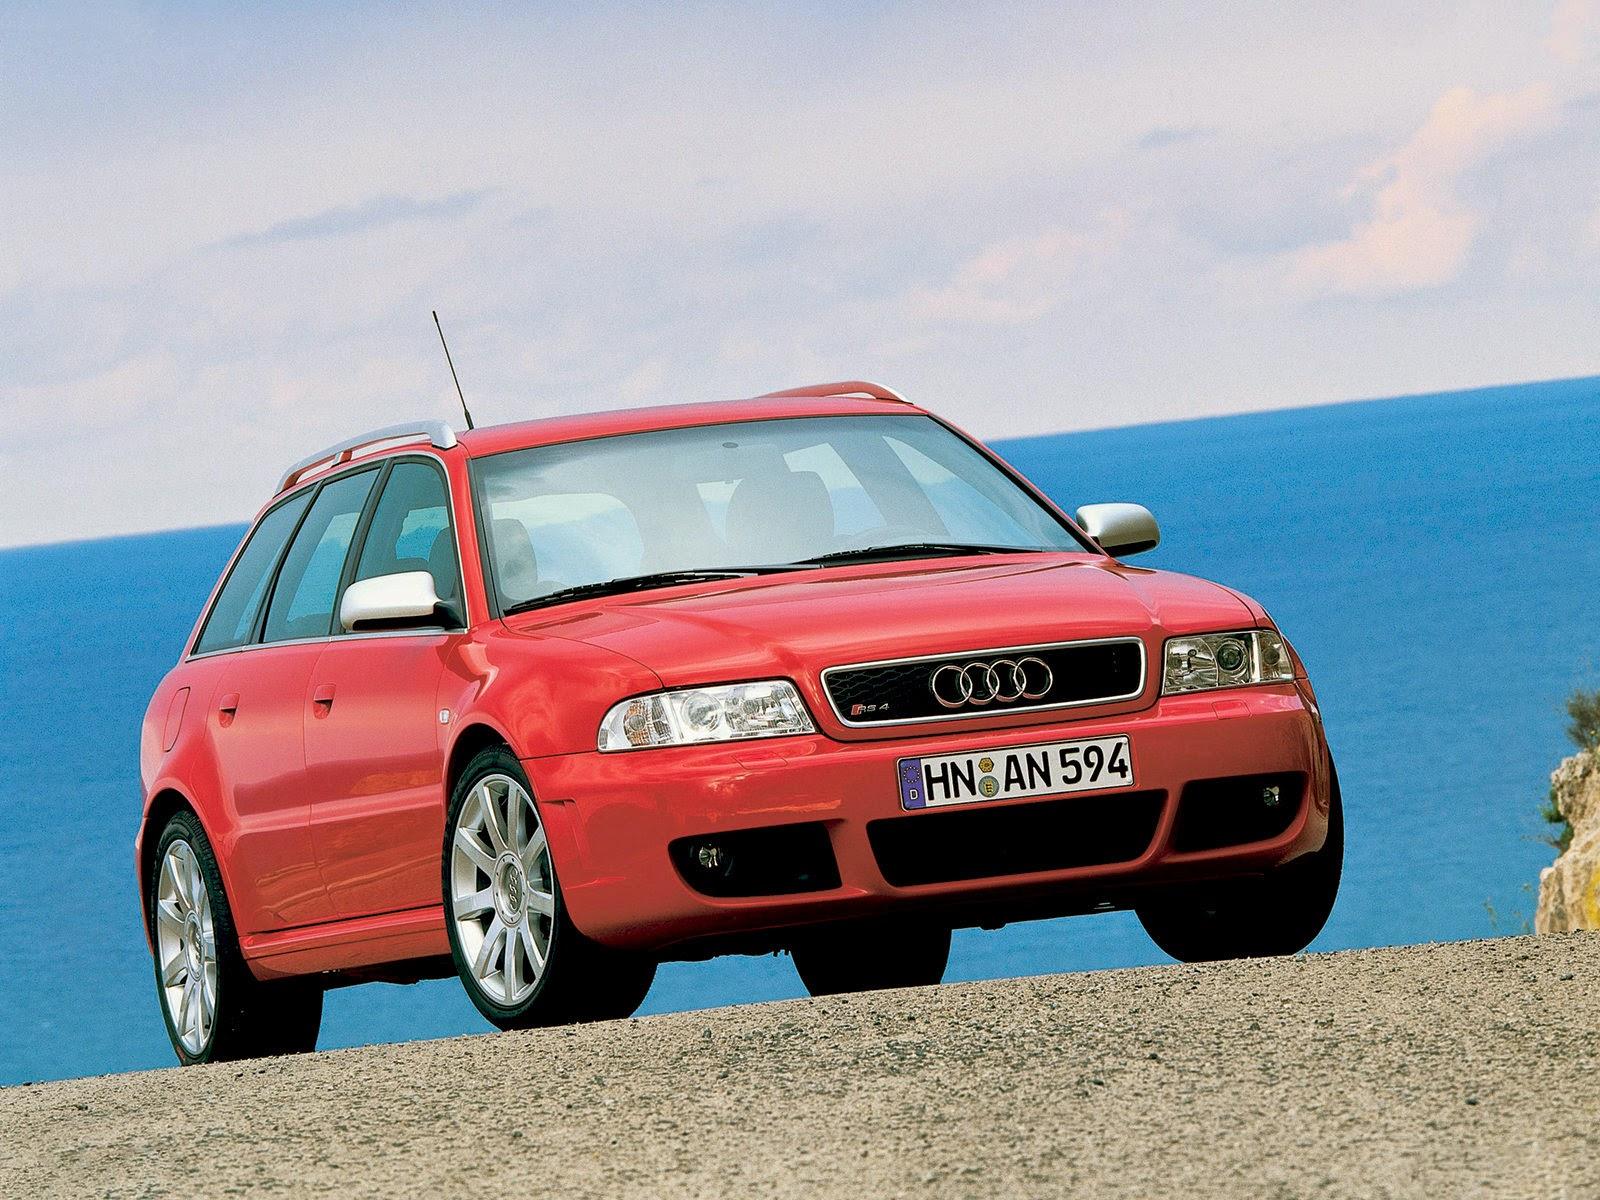 Audi RS 4 I (B5) 2000 - 2001 Station wagon 5 door #3